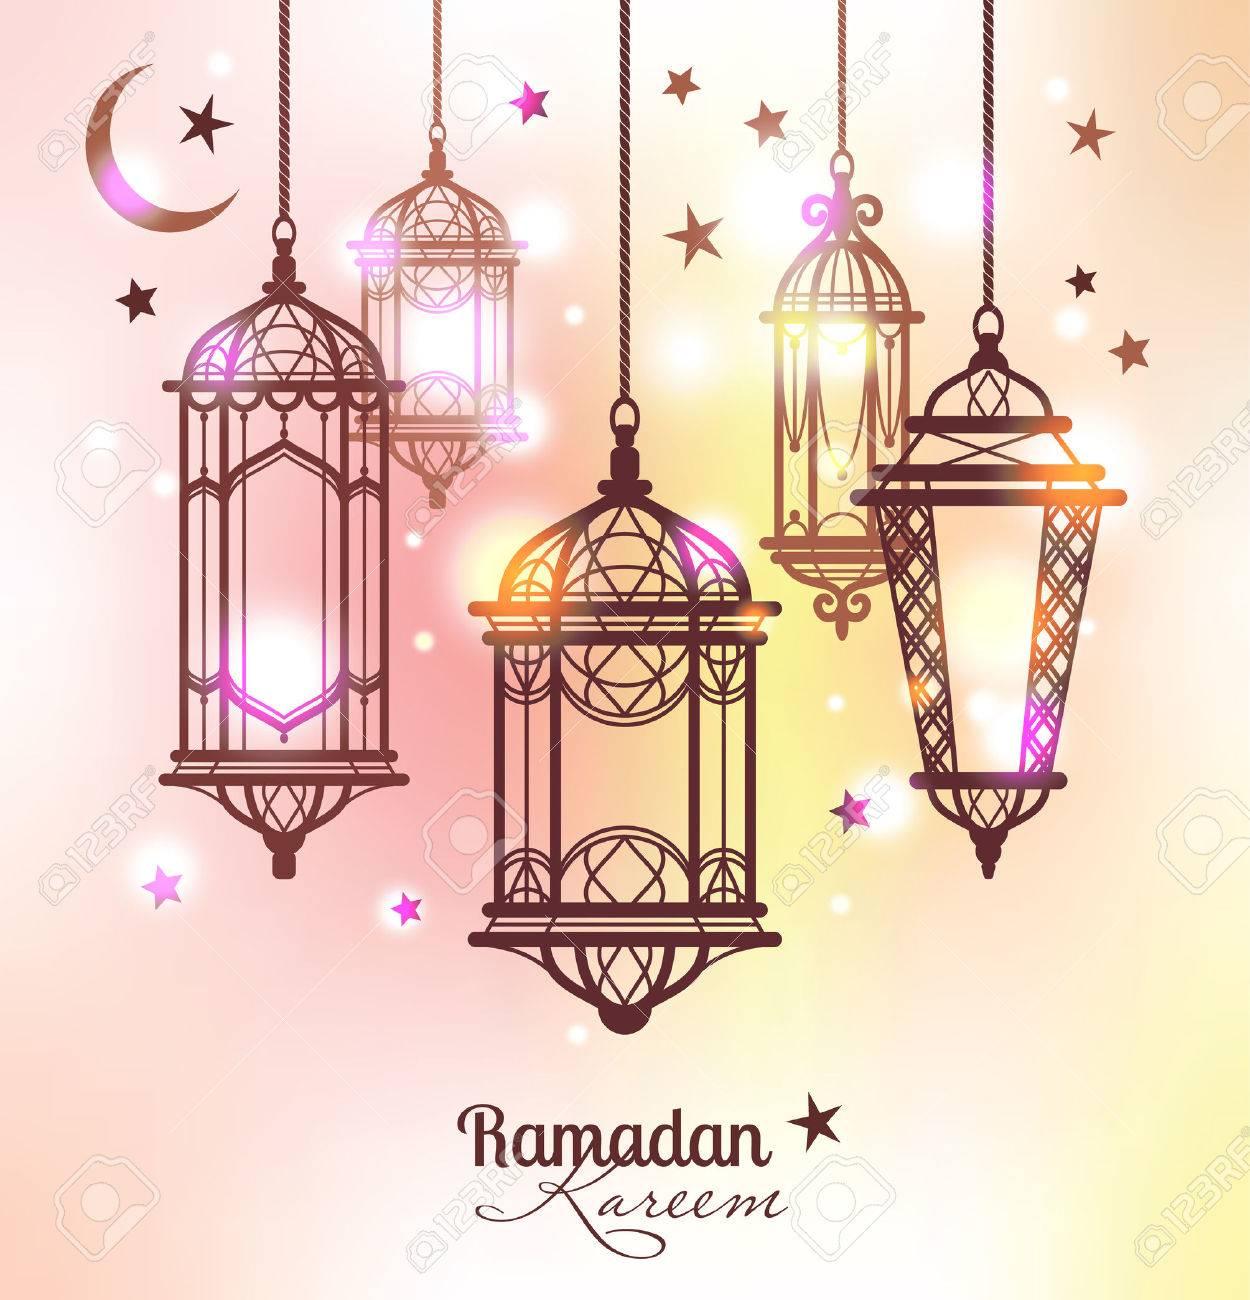 Ramadan Kareem Islamic Background Lamps For Ramadan Stock Vector